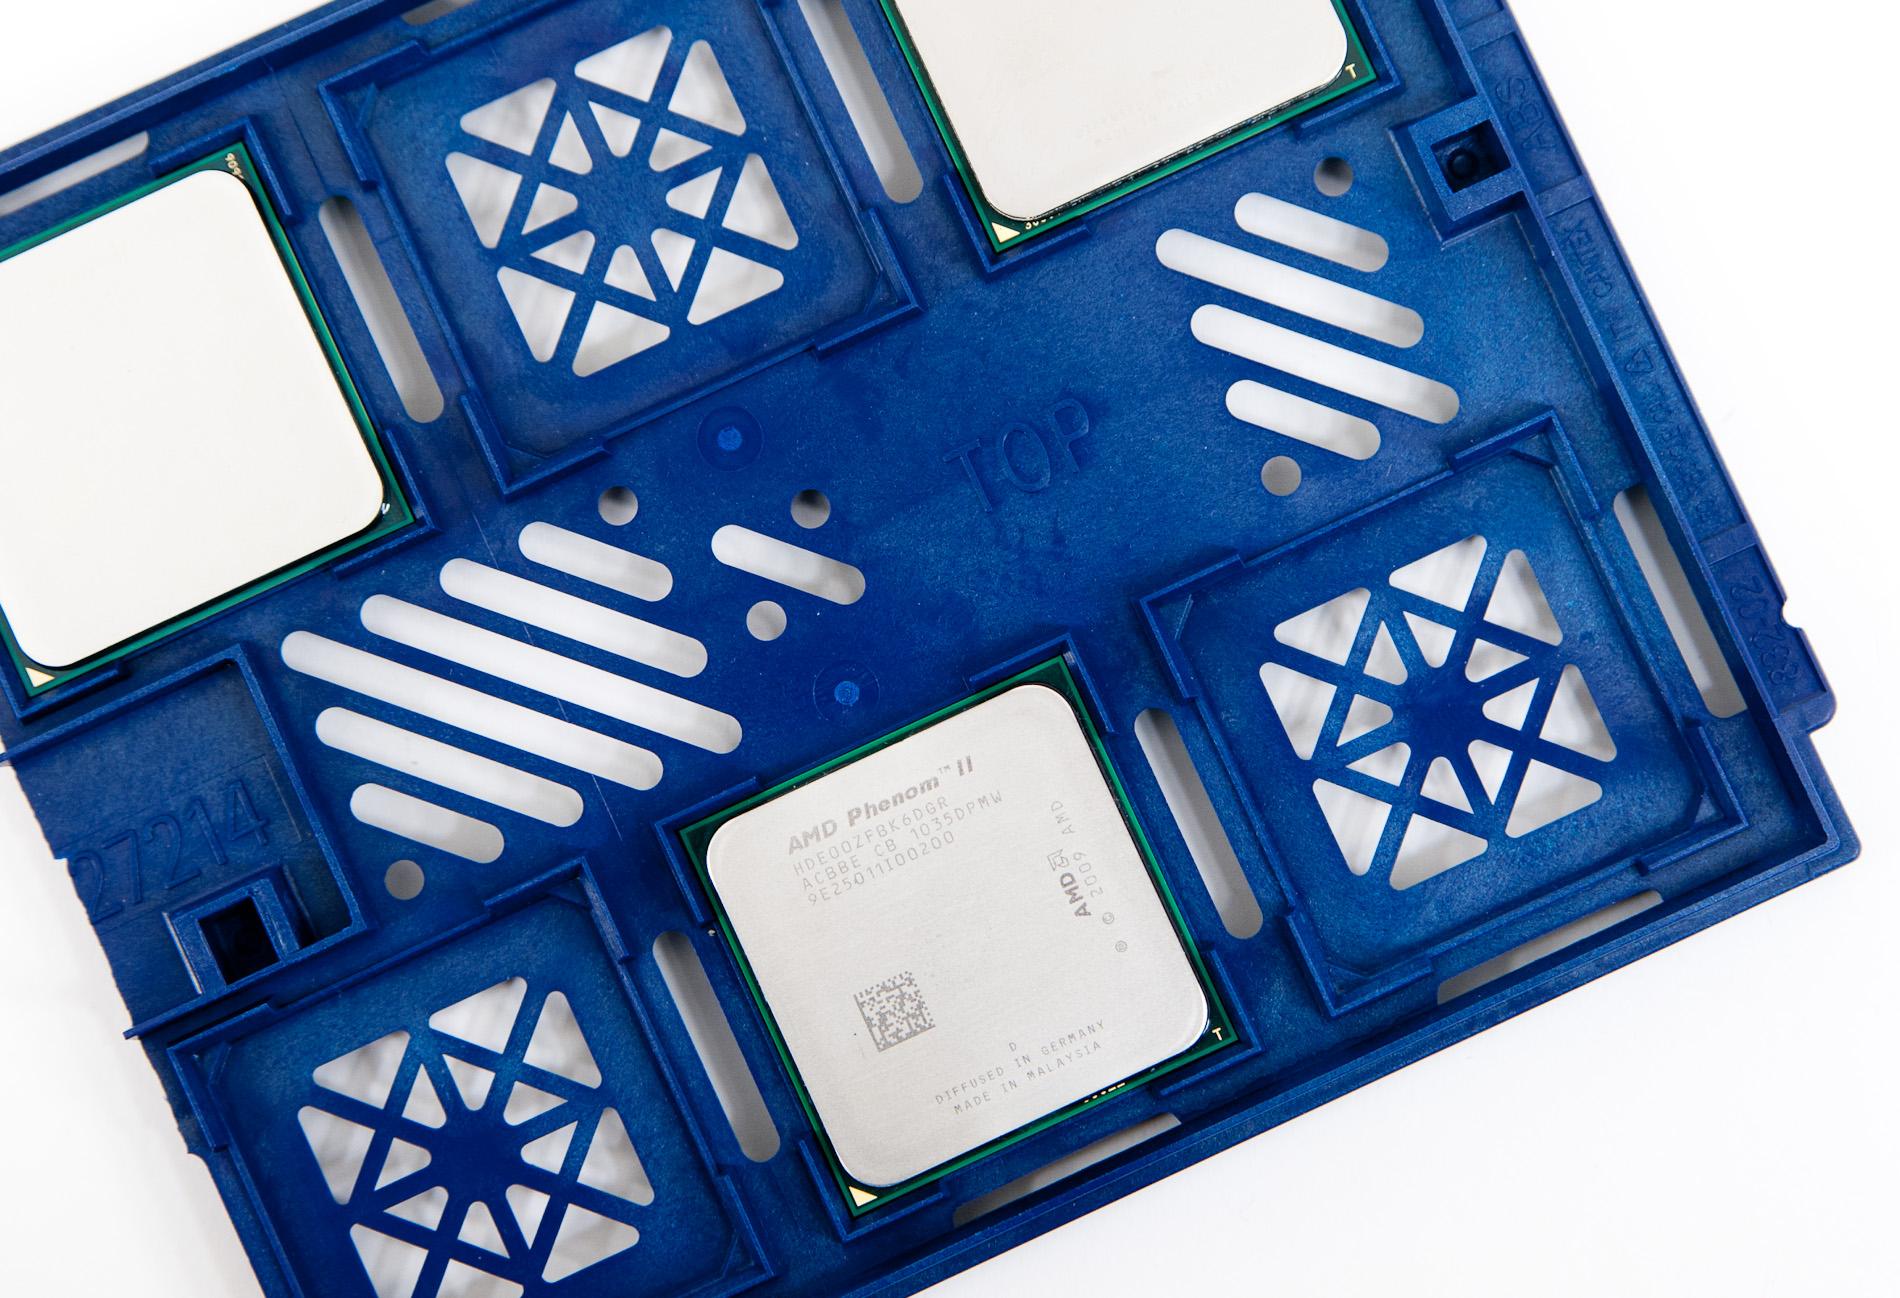 AMD s Winter Update Athlon II X3 455 Phenom II X2 565 and Phenom II X6 1100T